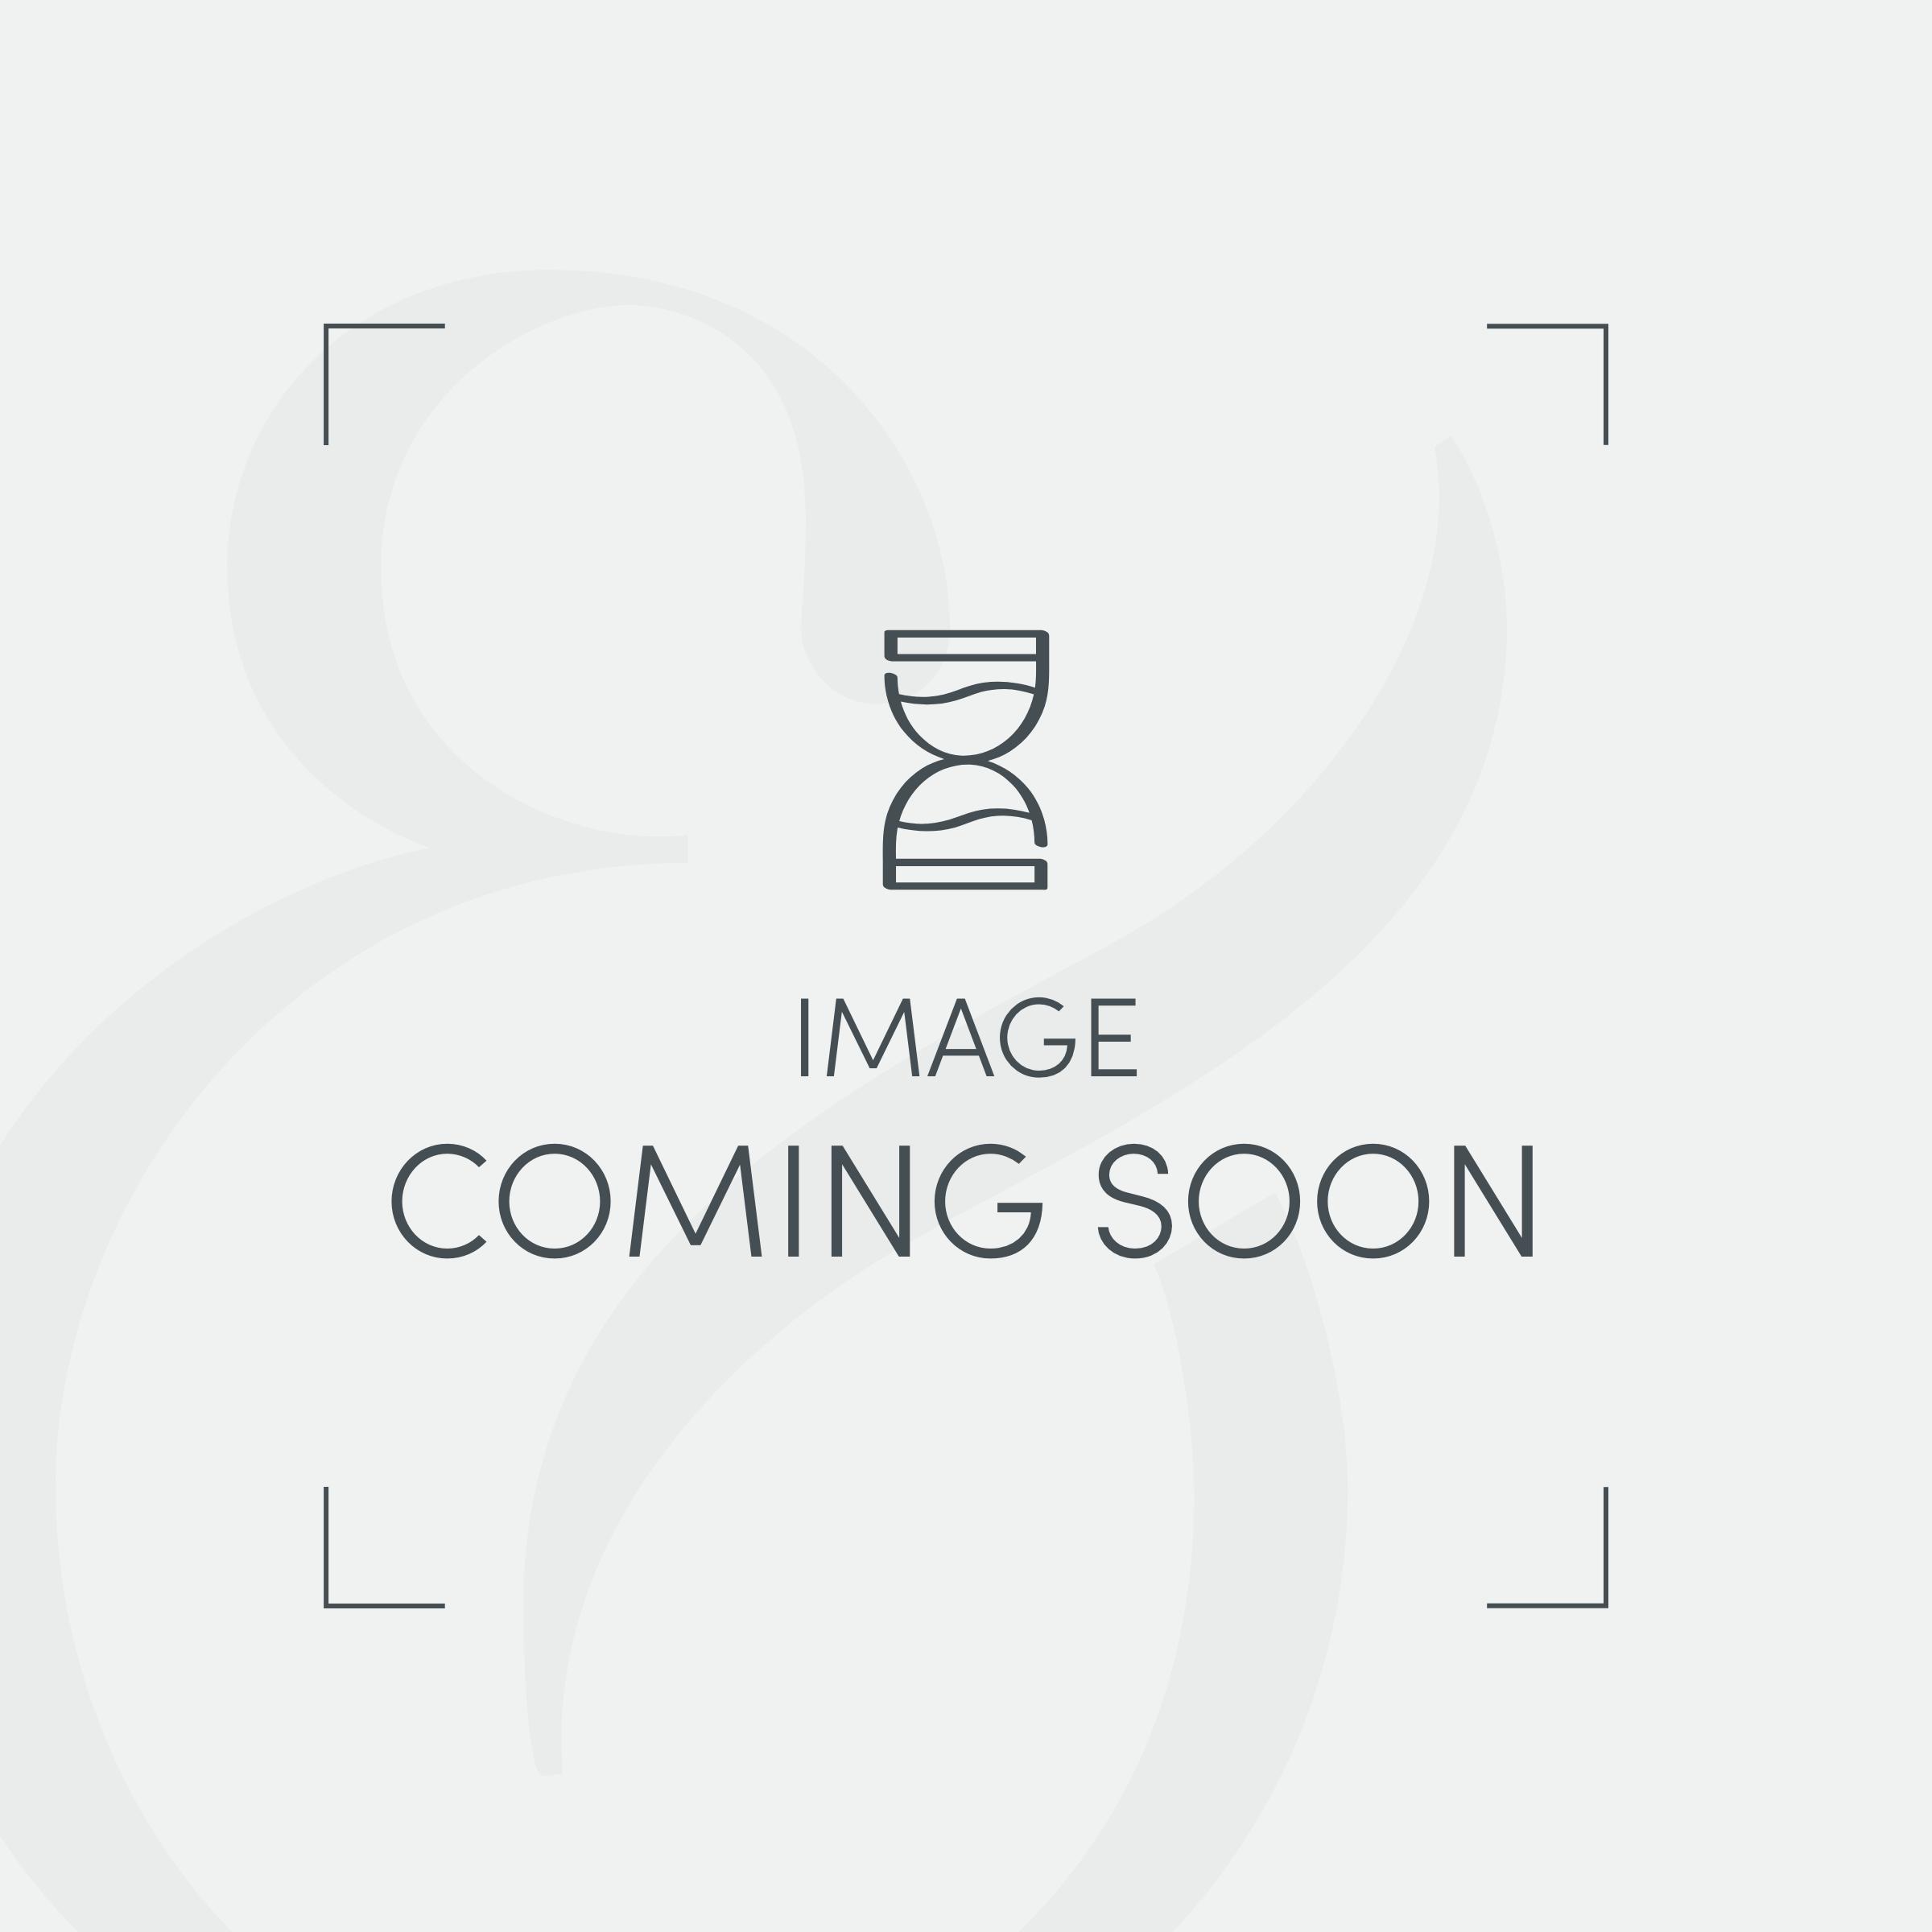 Luxury Egyptian Cotton Towel Bundle - Pink - 4 Pack Bath Sheet